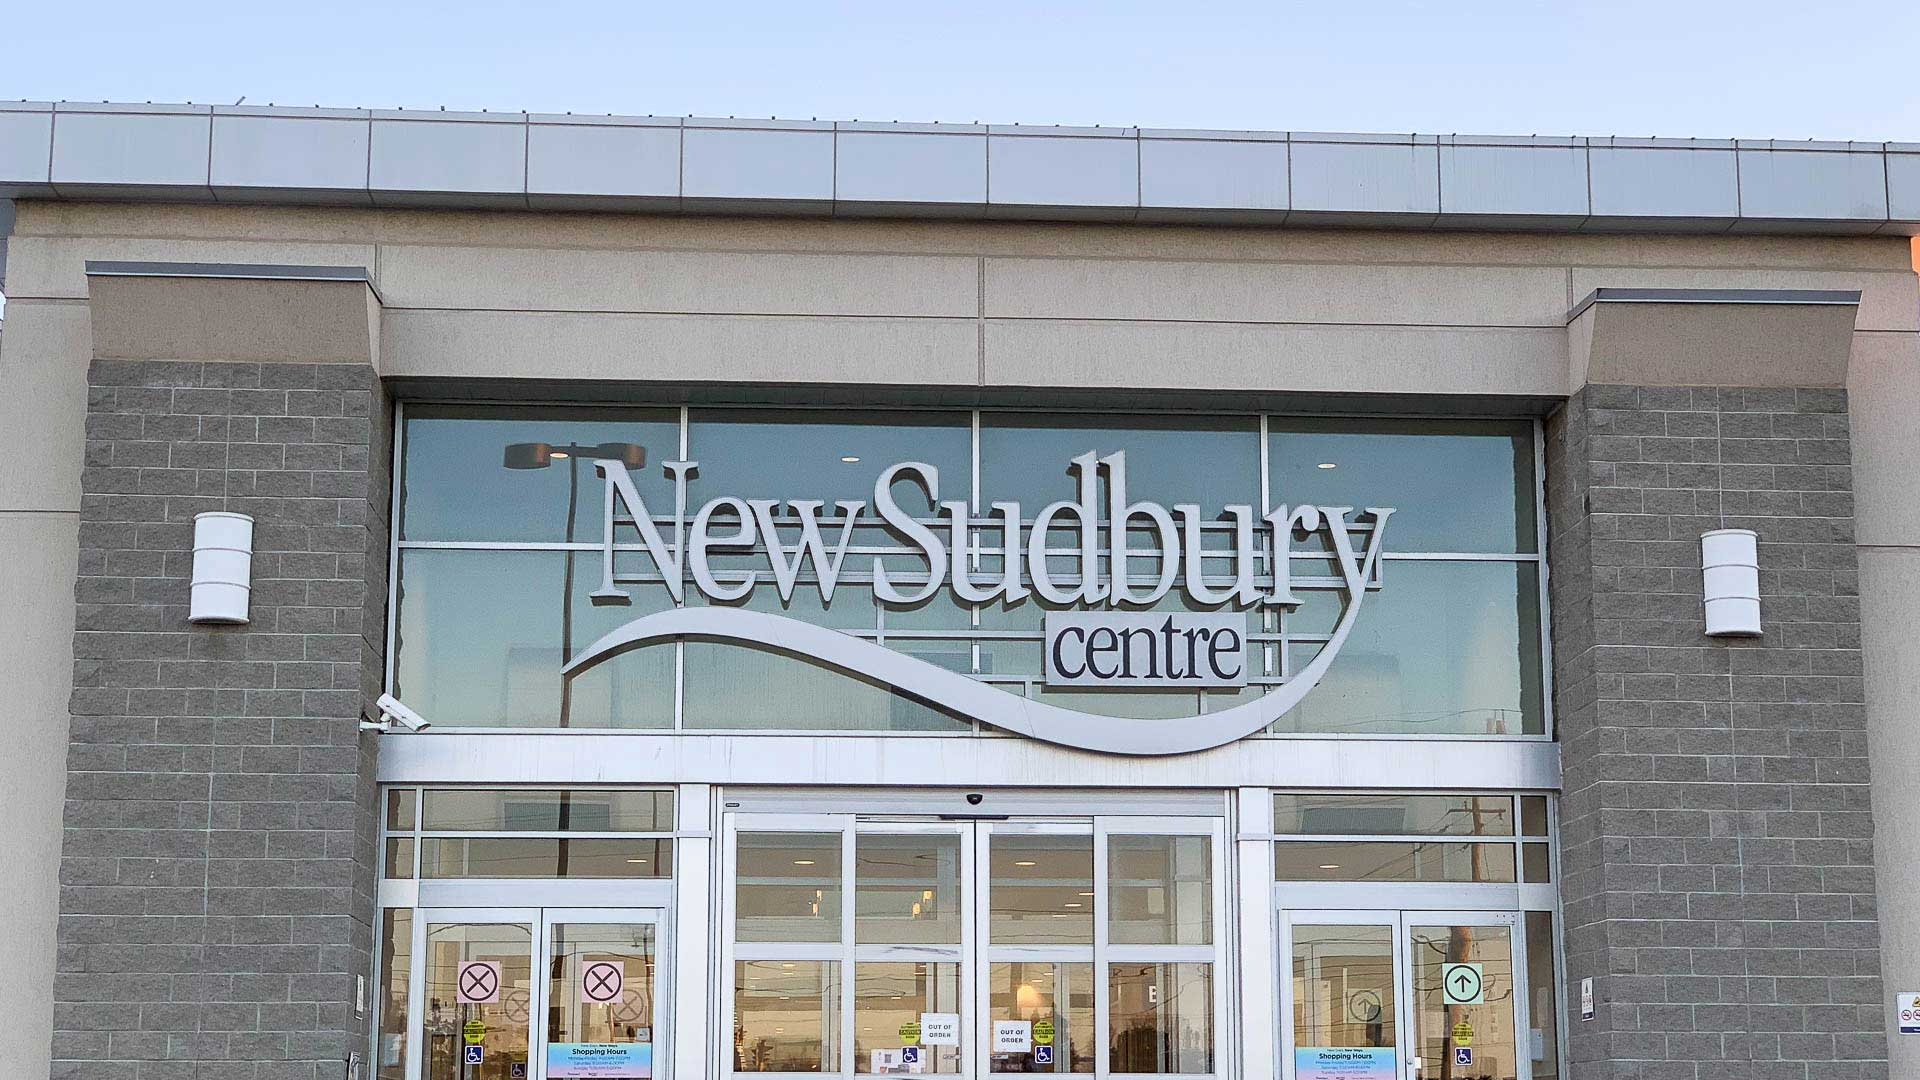 New-Sudbury